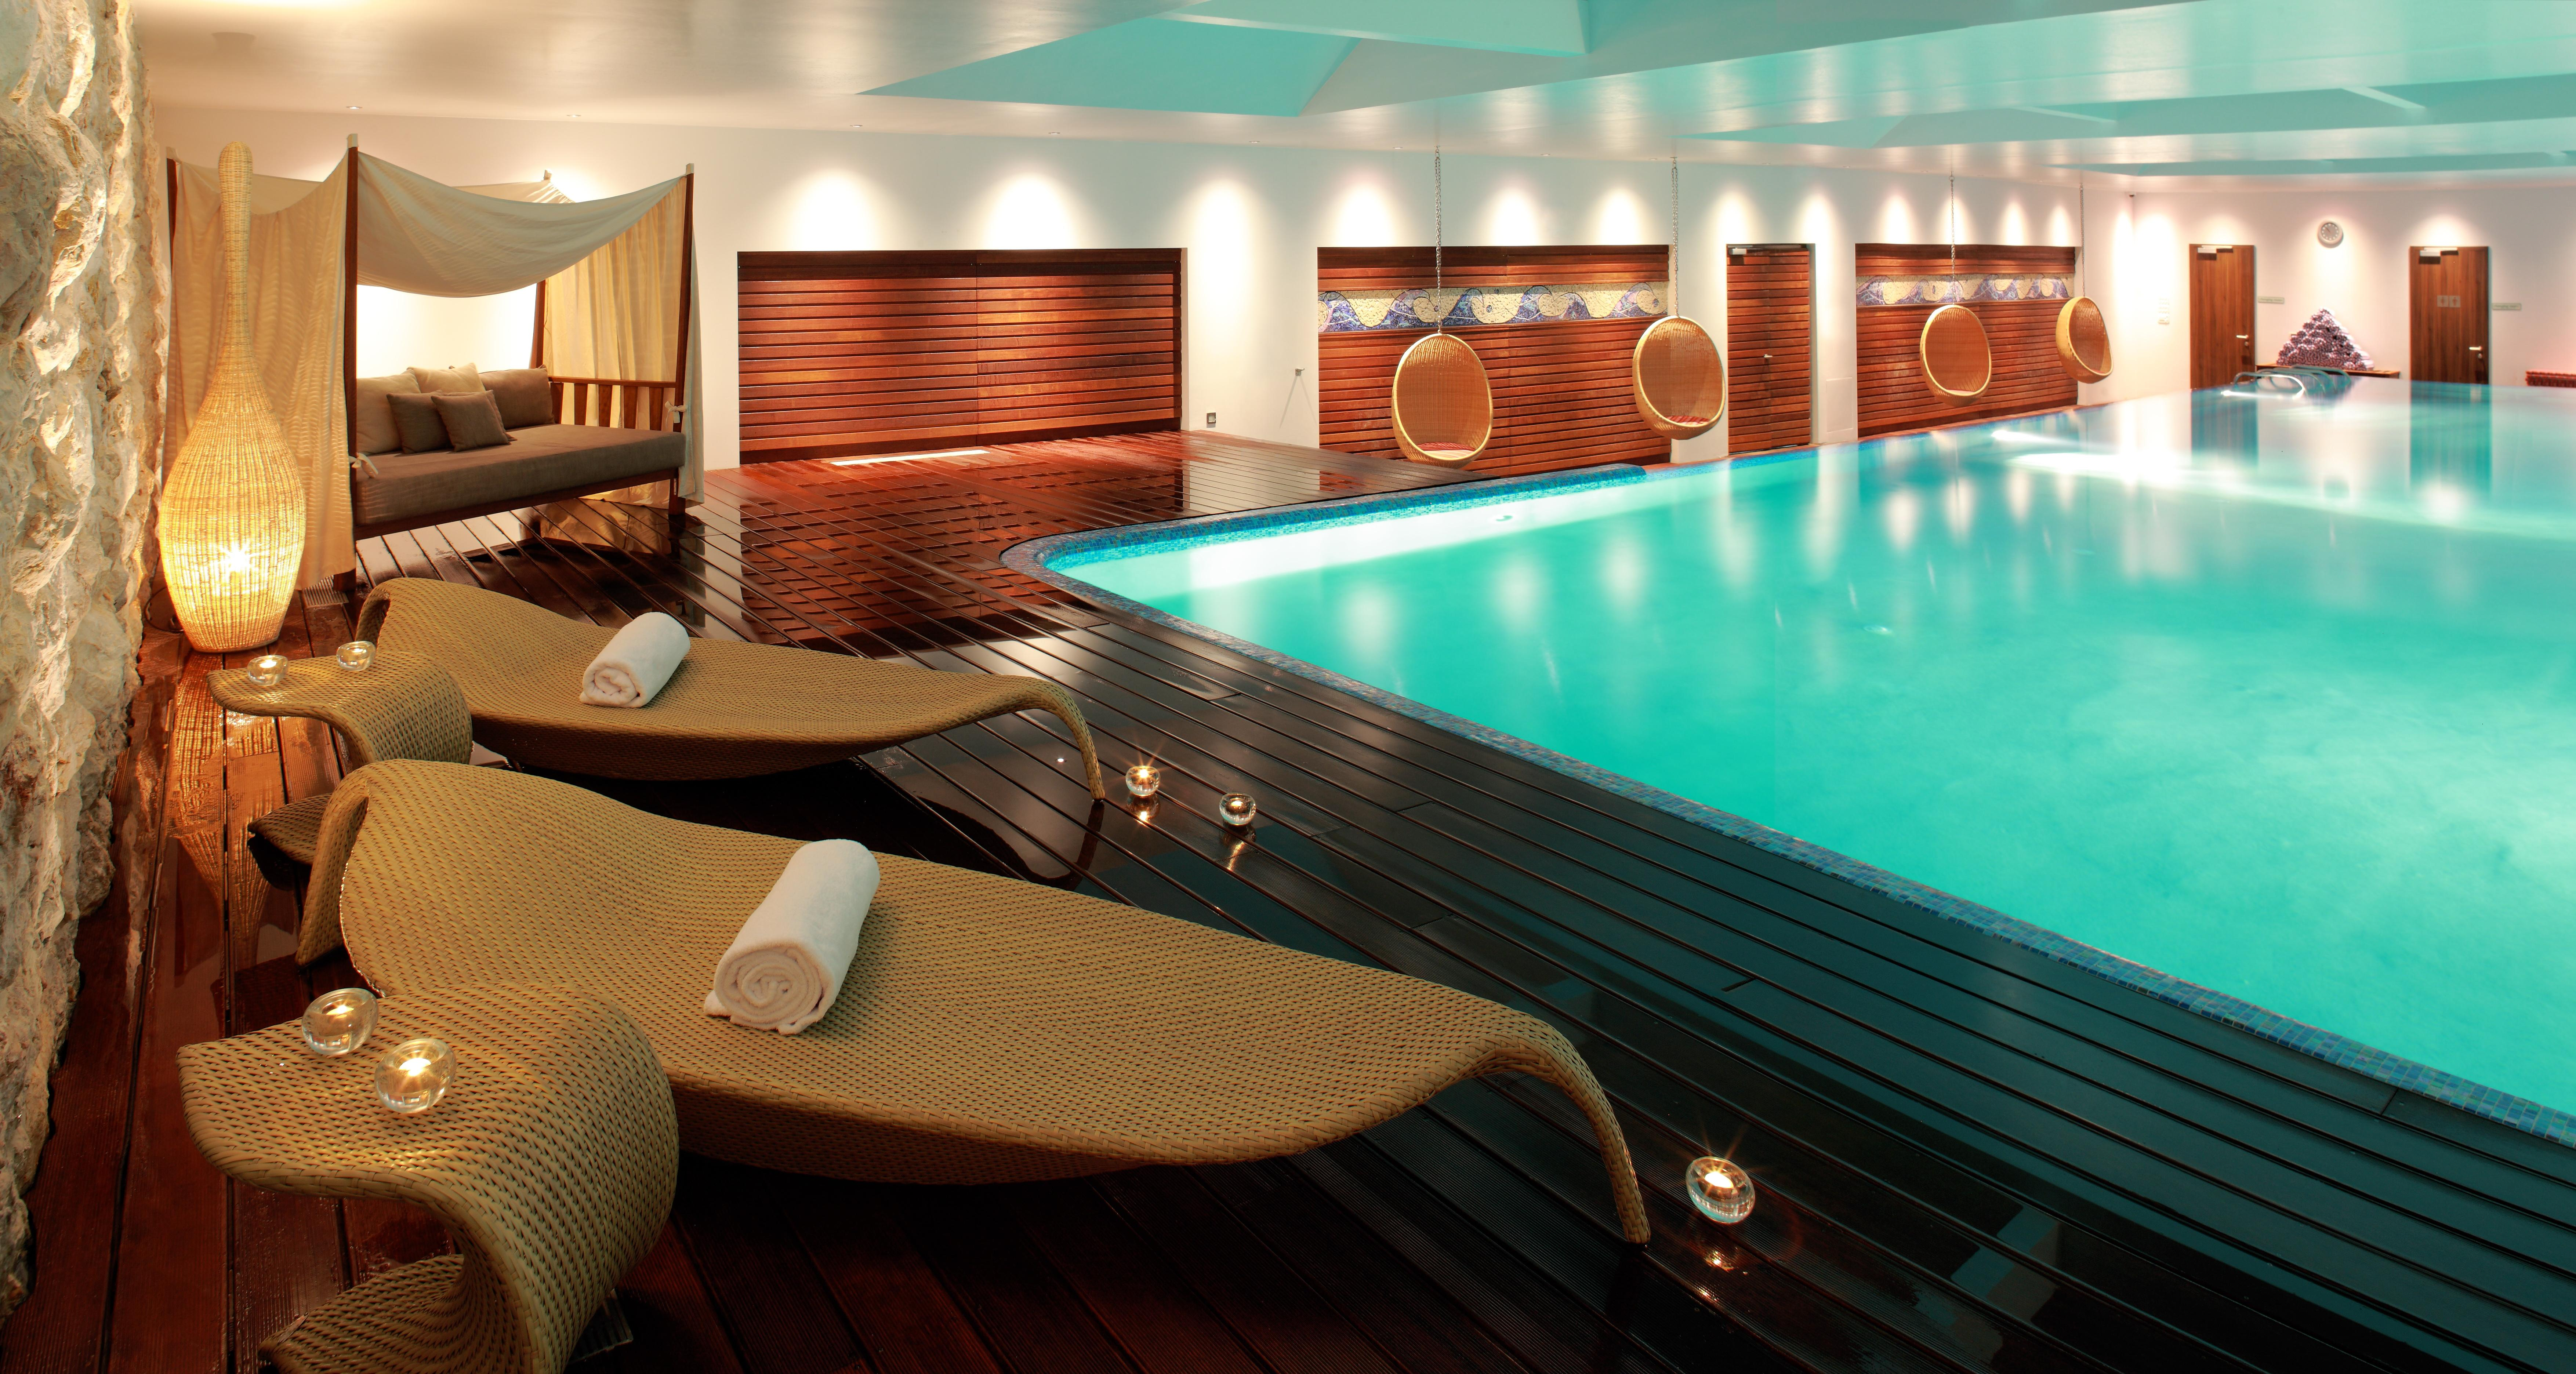 Adriana Sensori Spa Amp Wellness Suncani Hvar Hotels Croatia